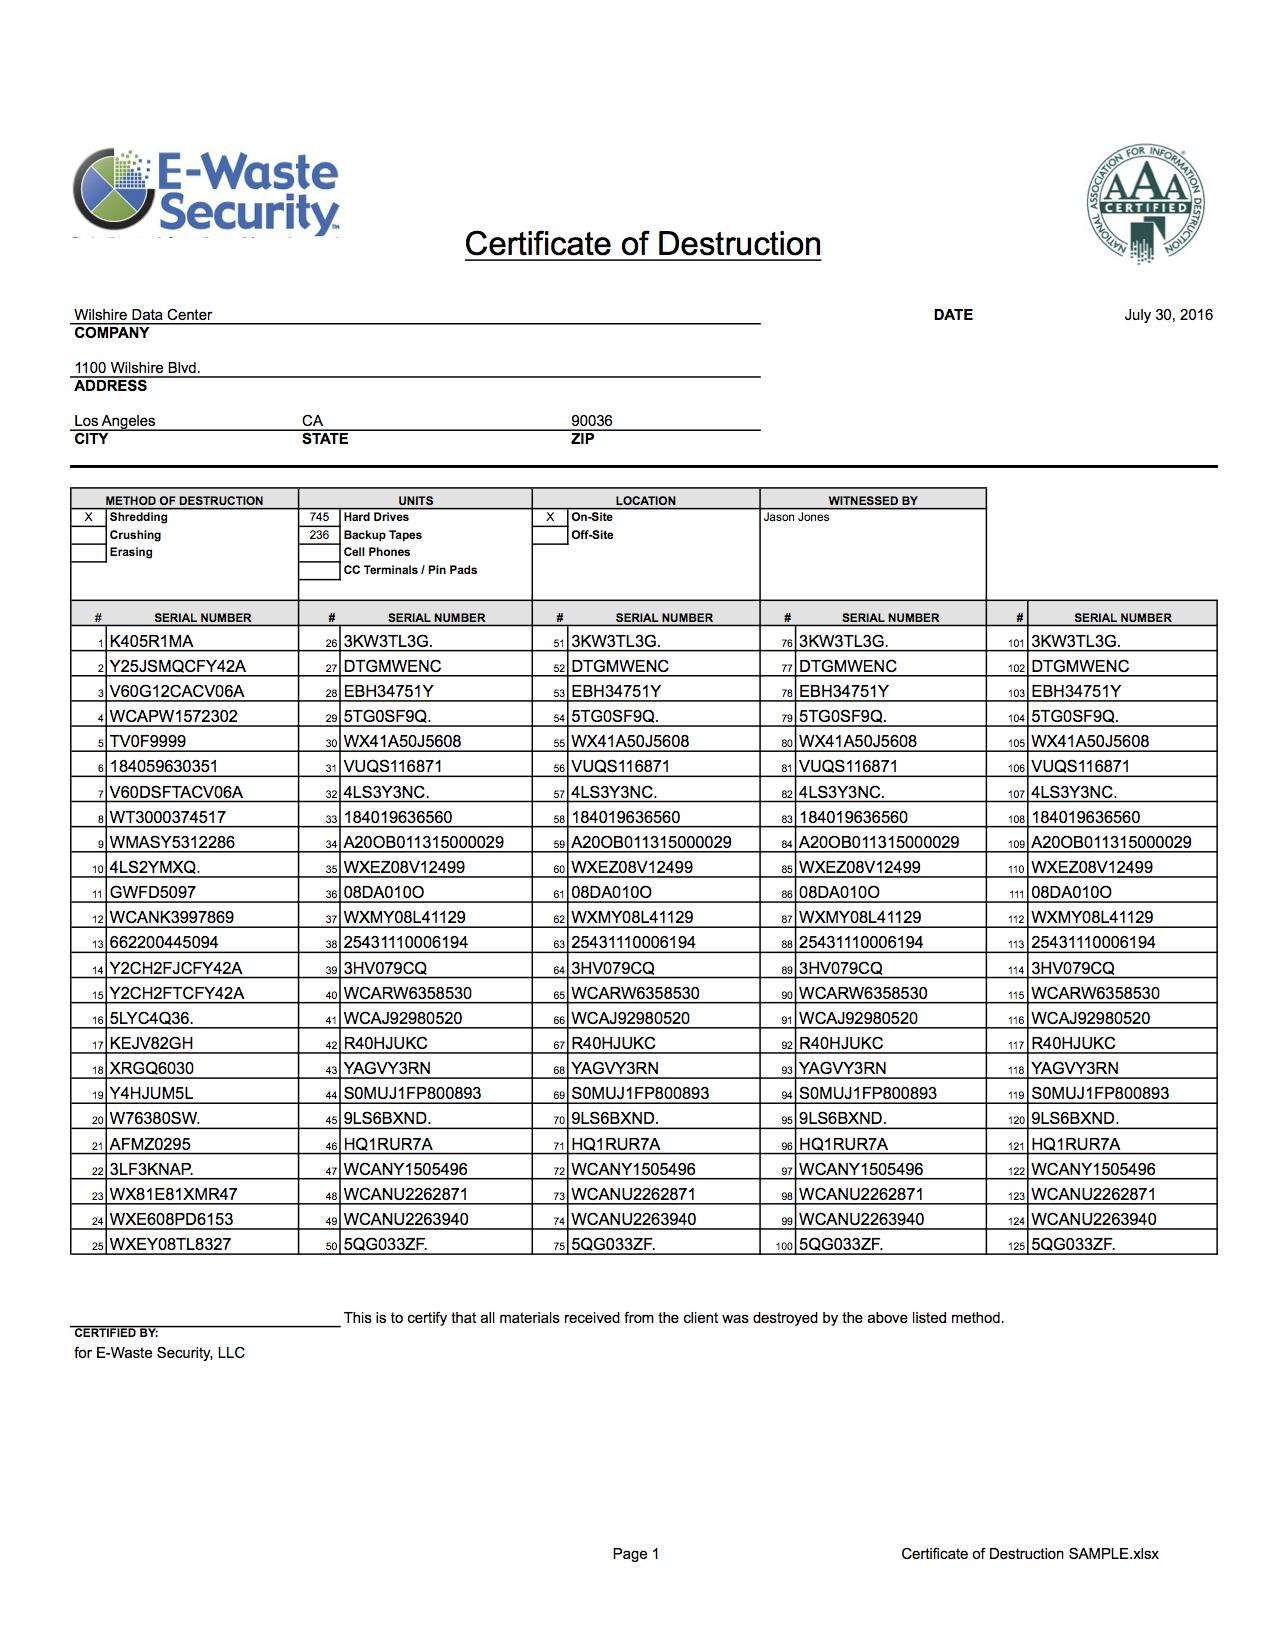 Certificate Of Destruction - Hard Drive Destruction - E Throughout Hard Drive Destruction Certificate Template